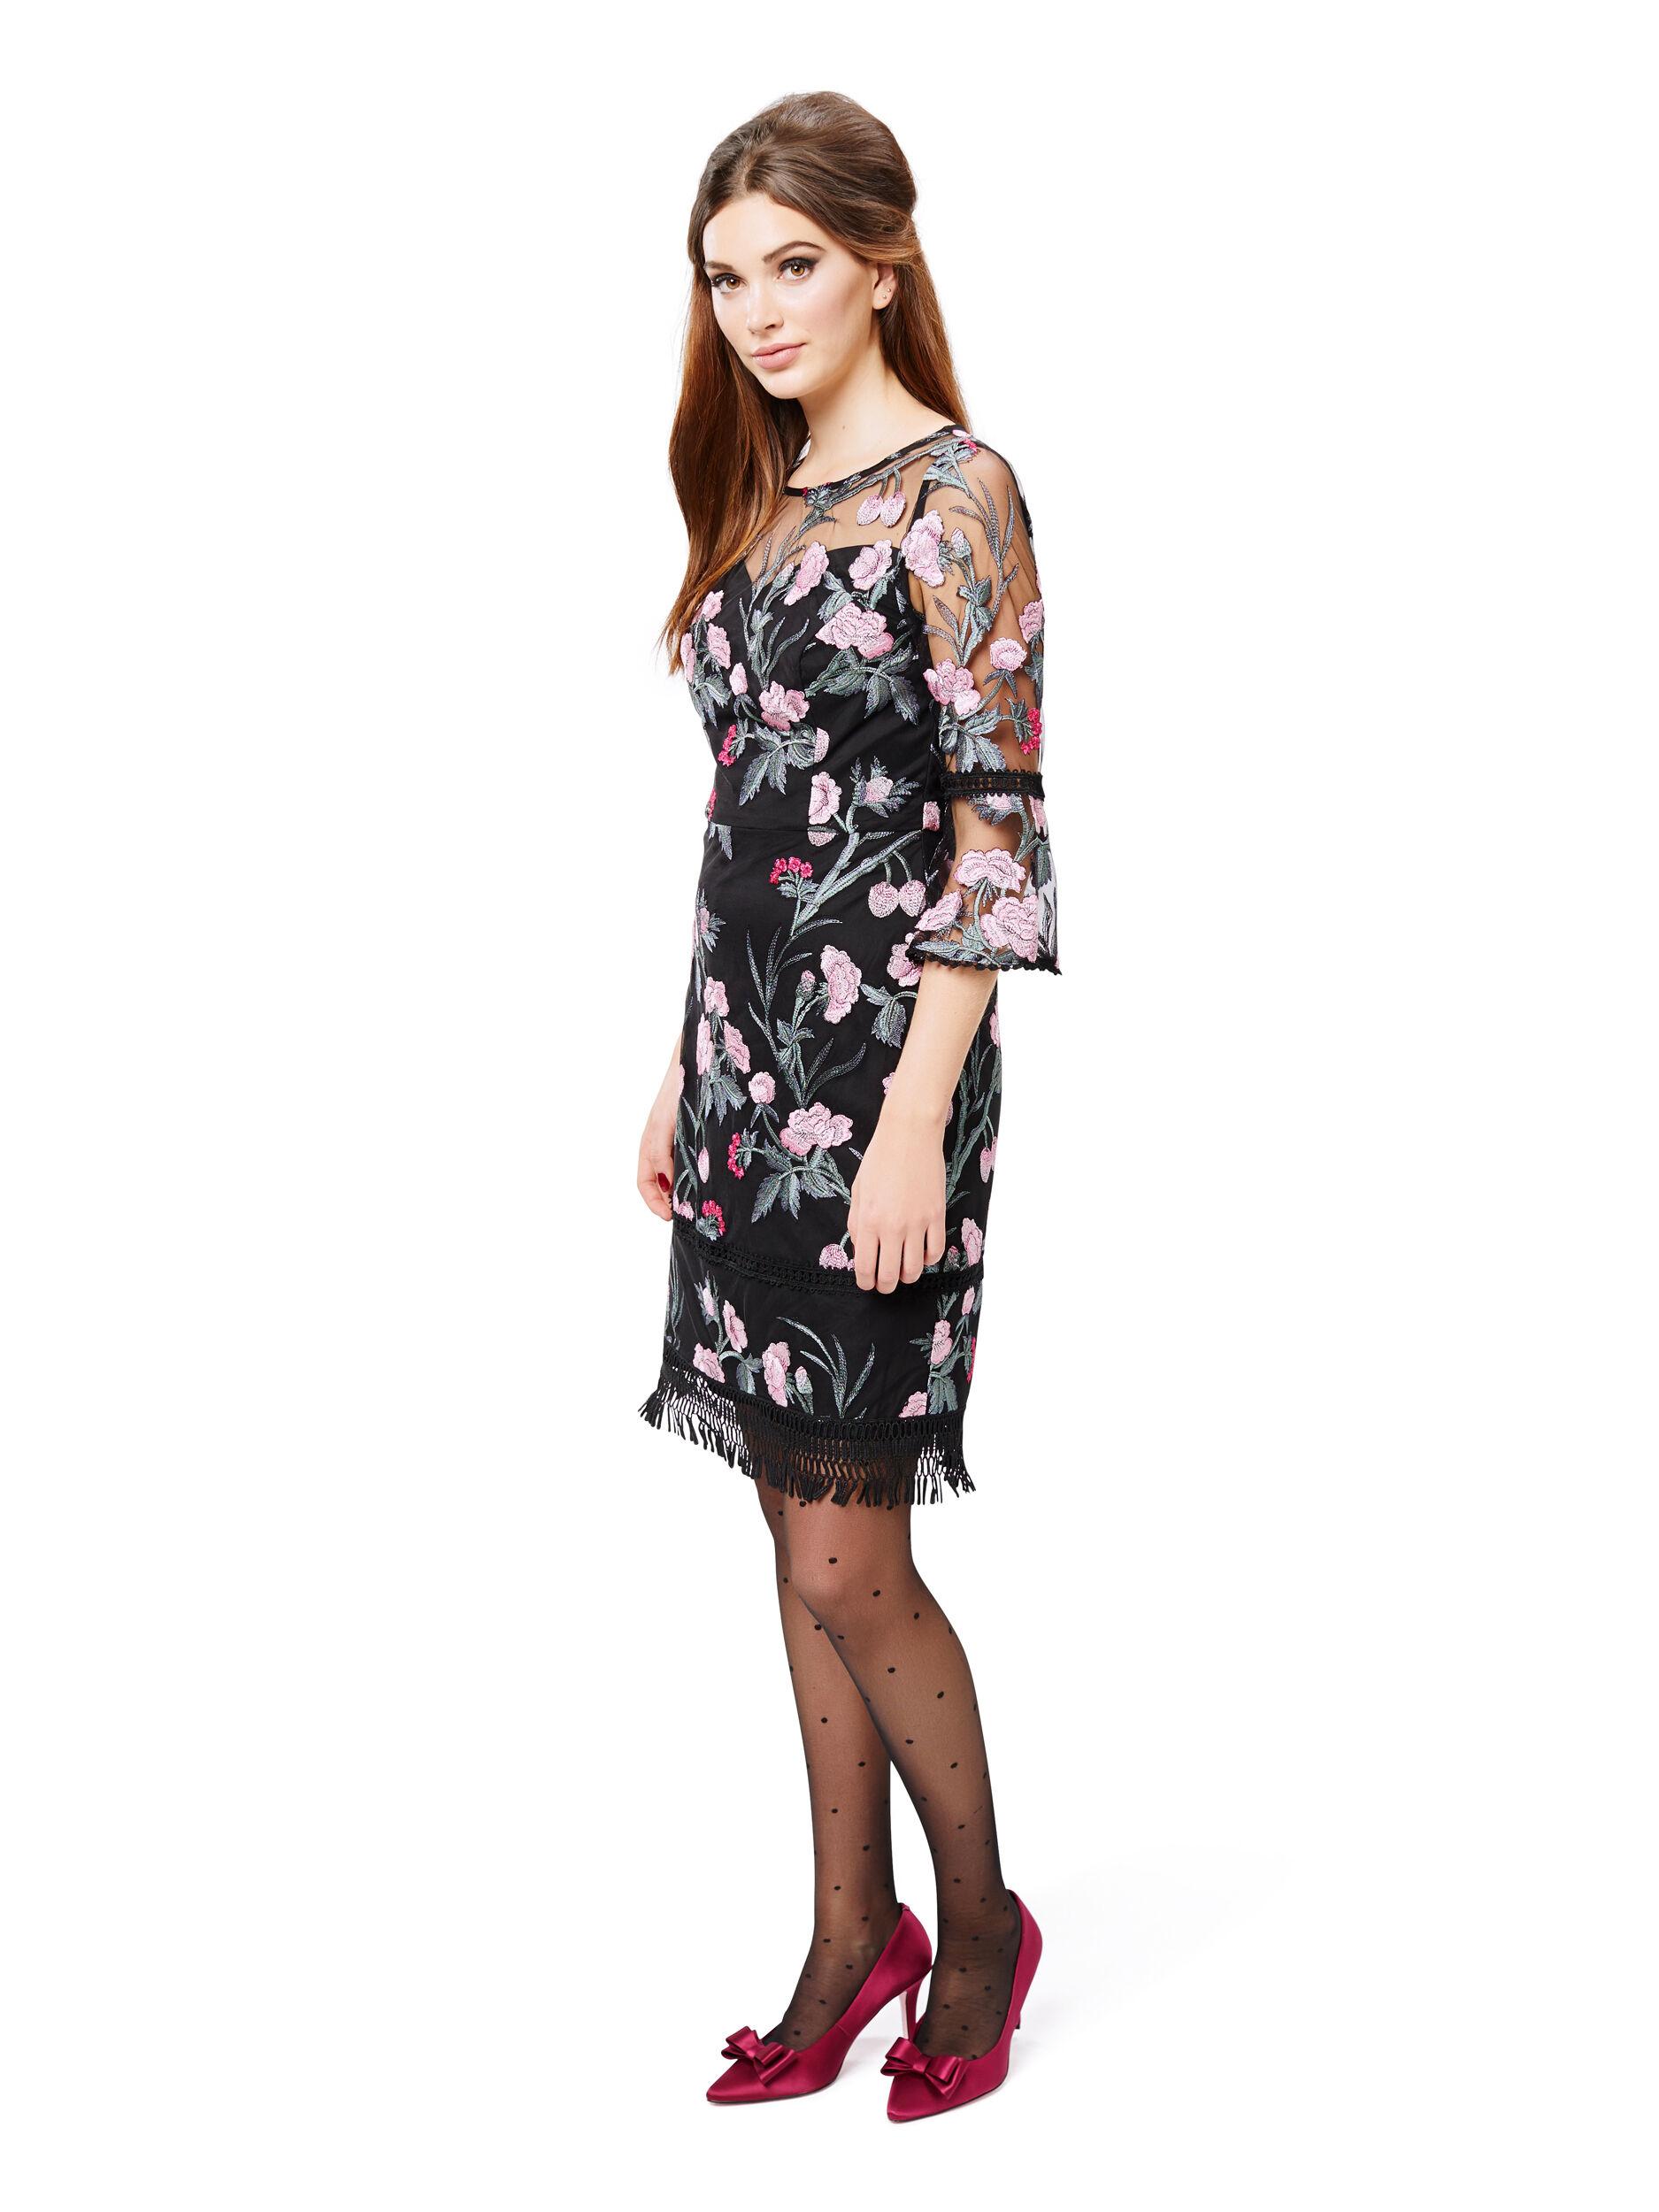 Flowers And Romance Dress